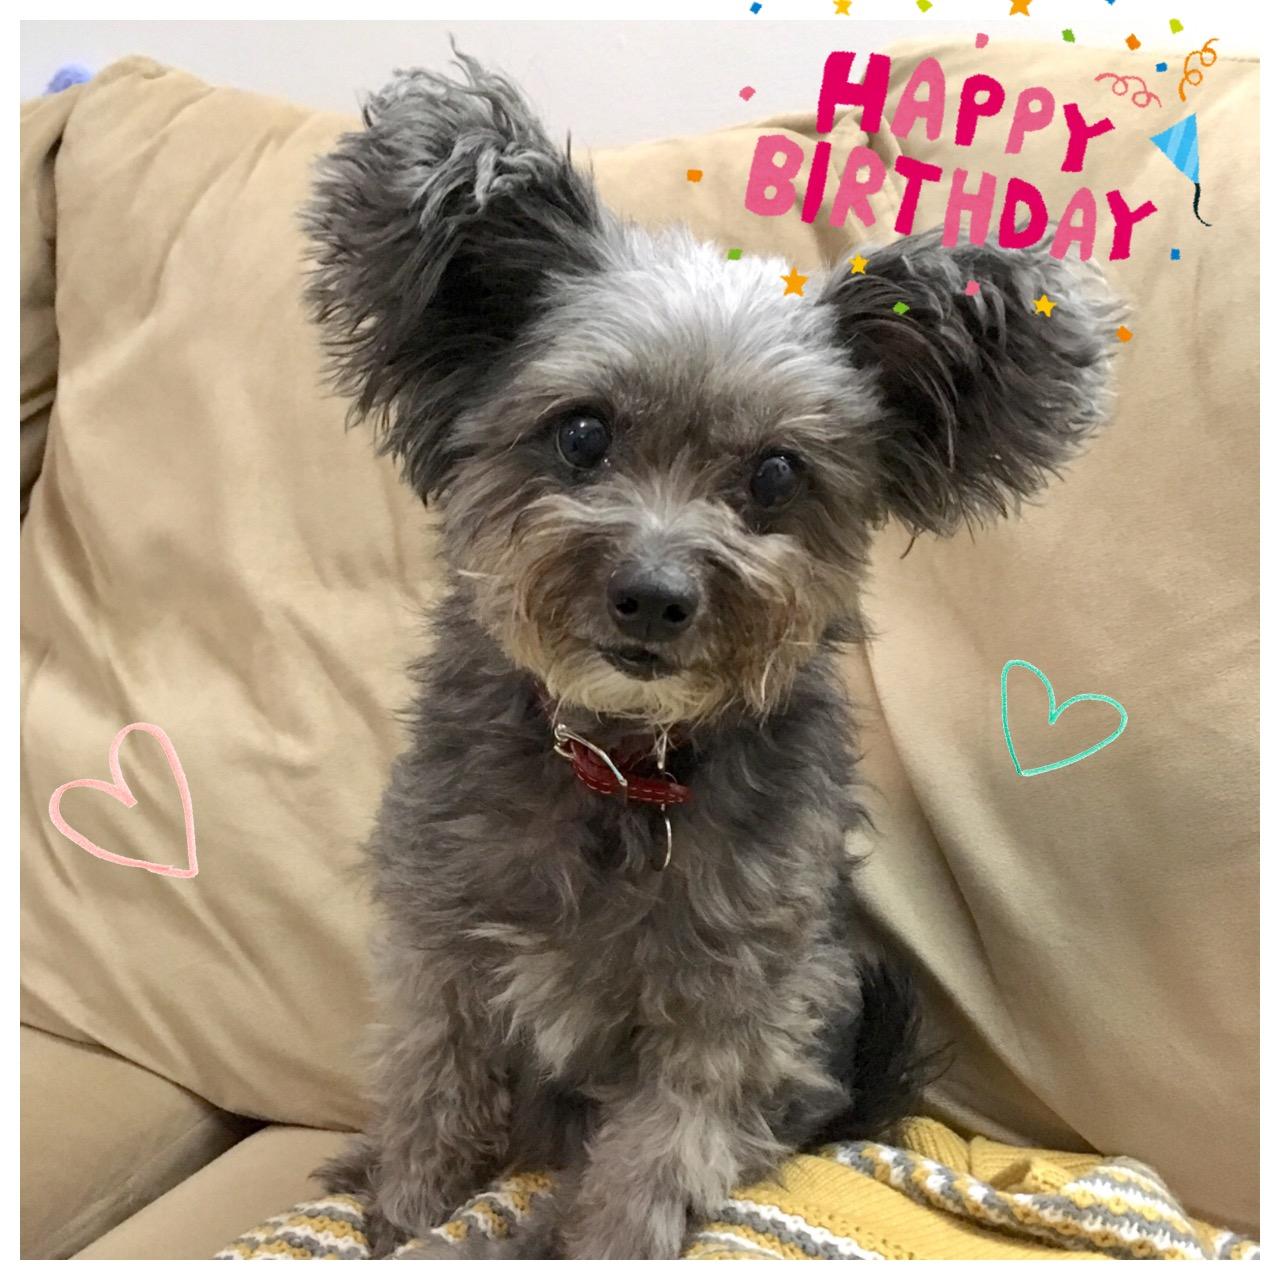 Momiji had her Birthday on Dec 30. She turned 10 years old!